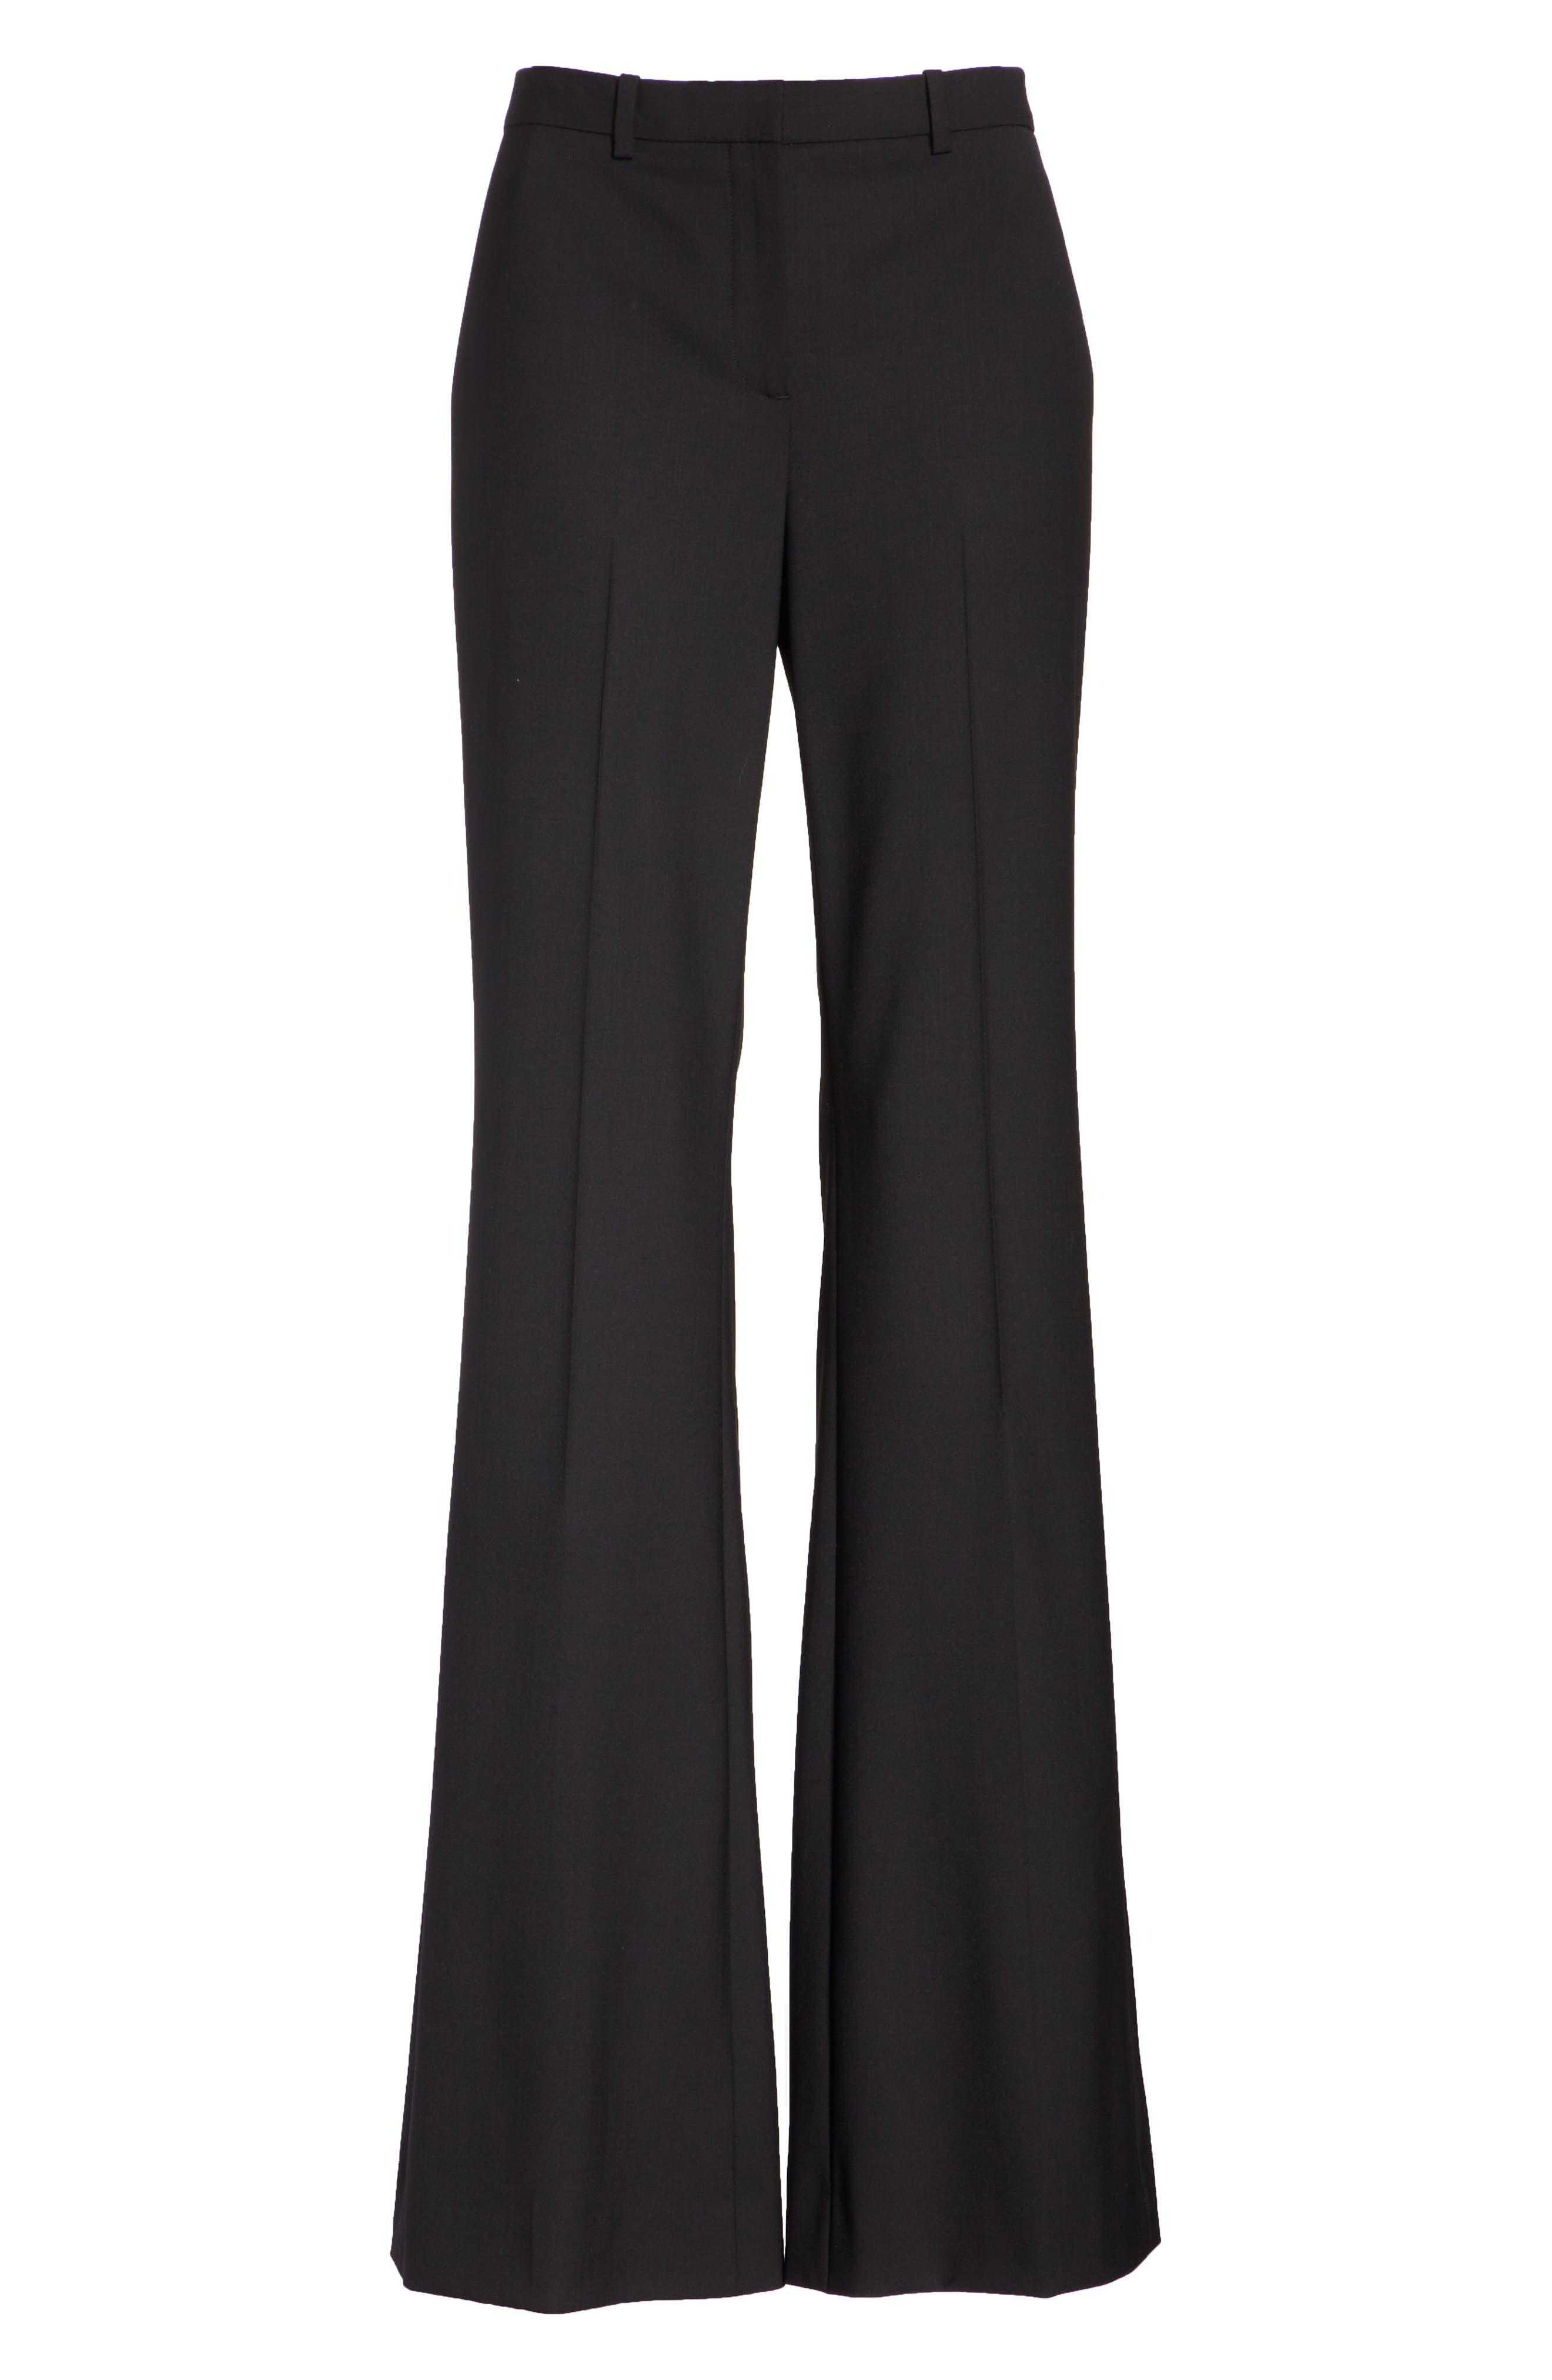 Demitria 2 Stretch Wool Suit Pants,                             Alternate thumbnail 6, color,                             Black